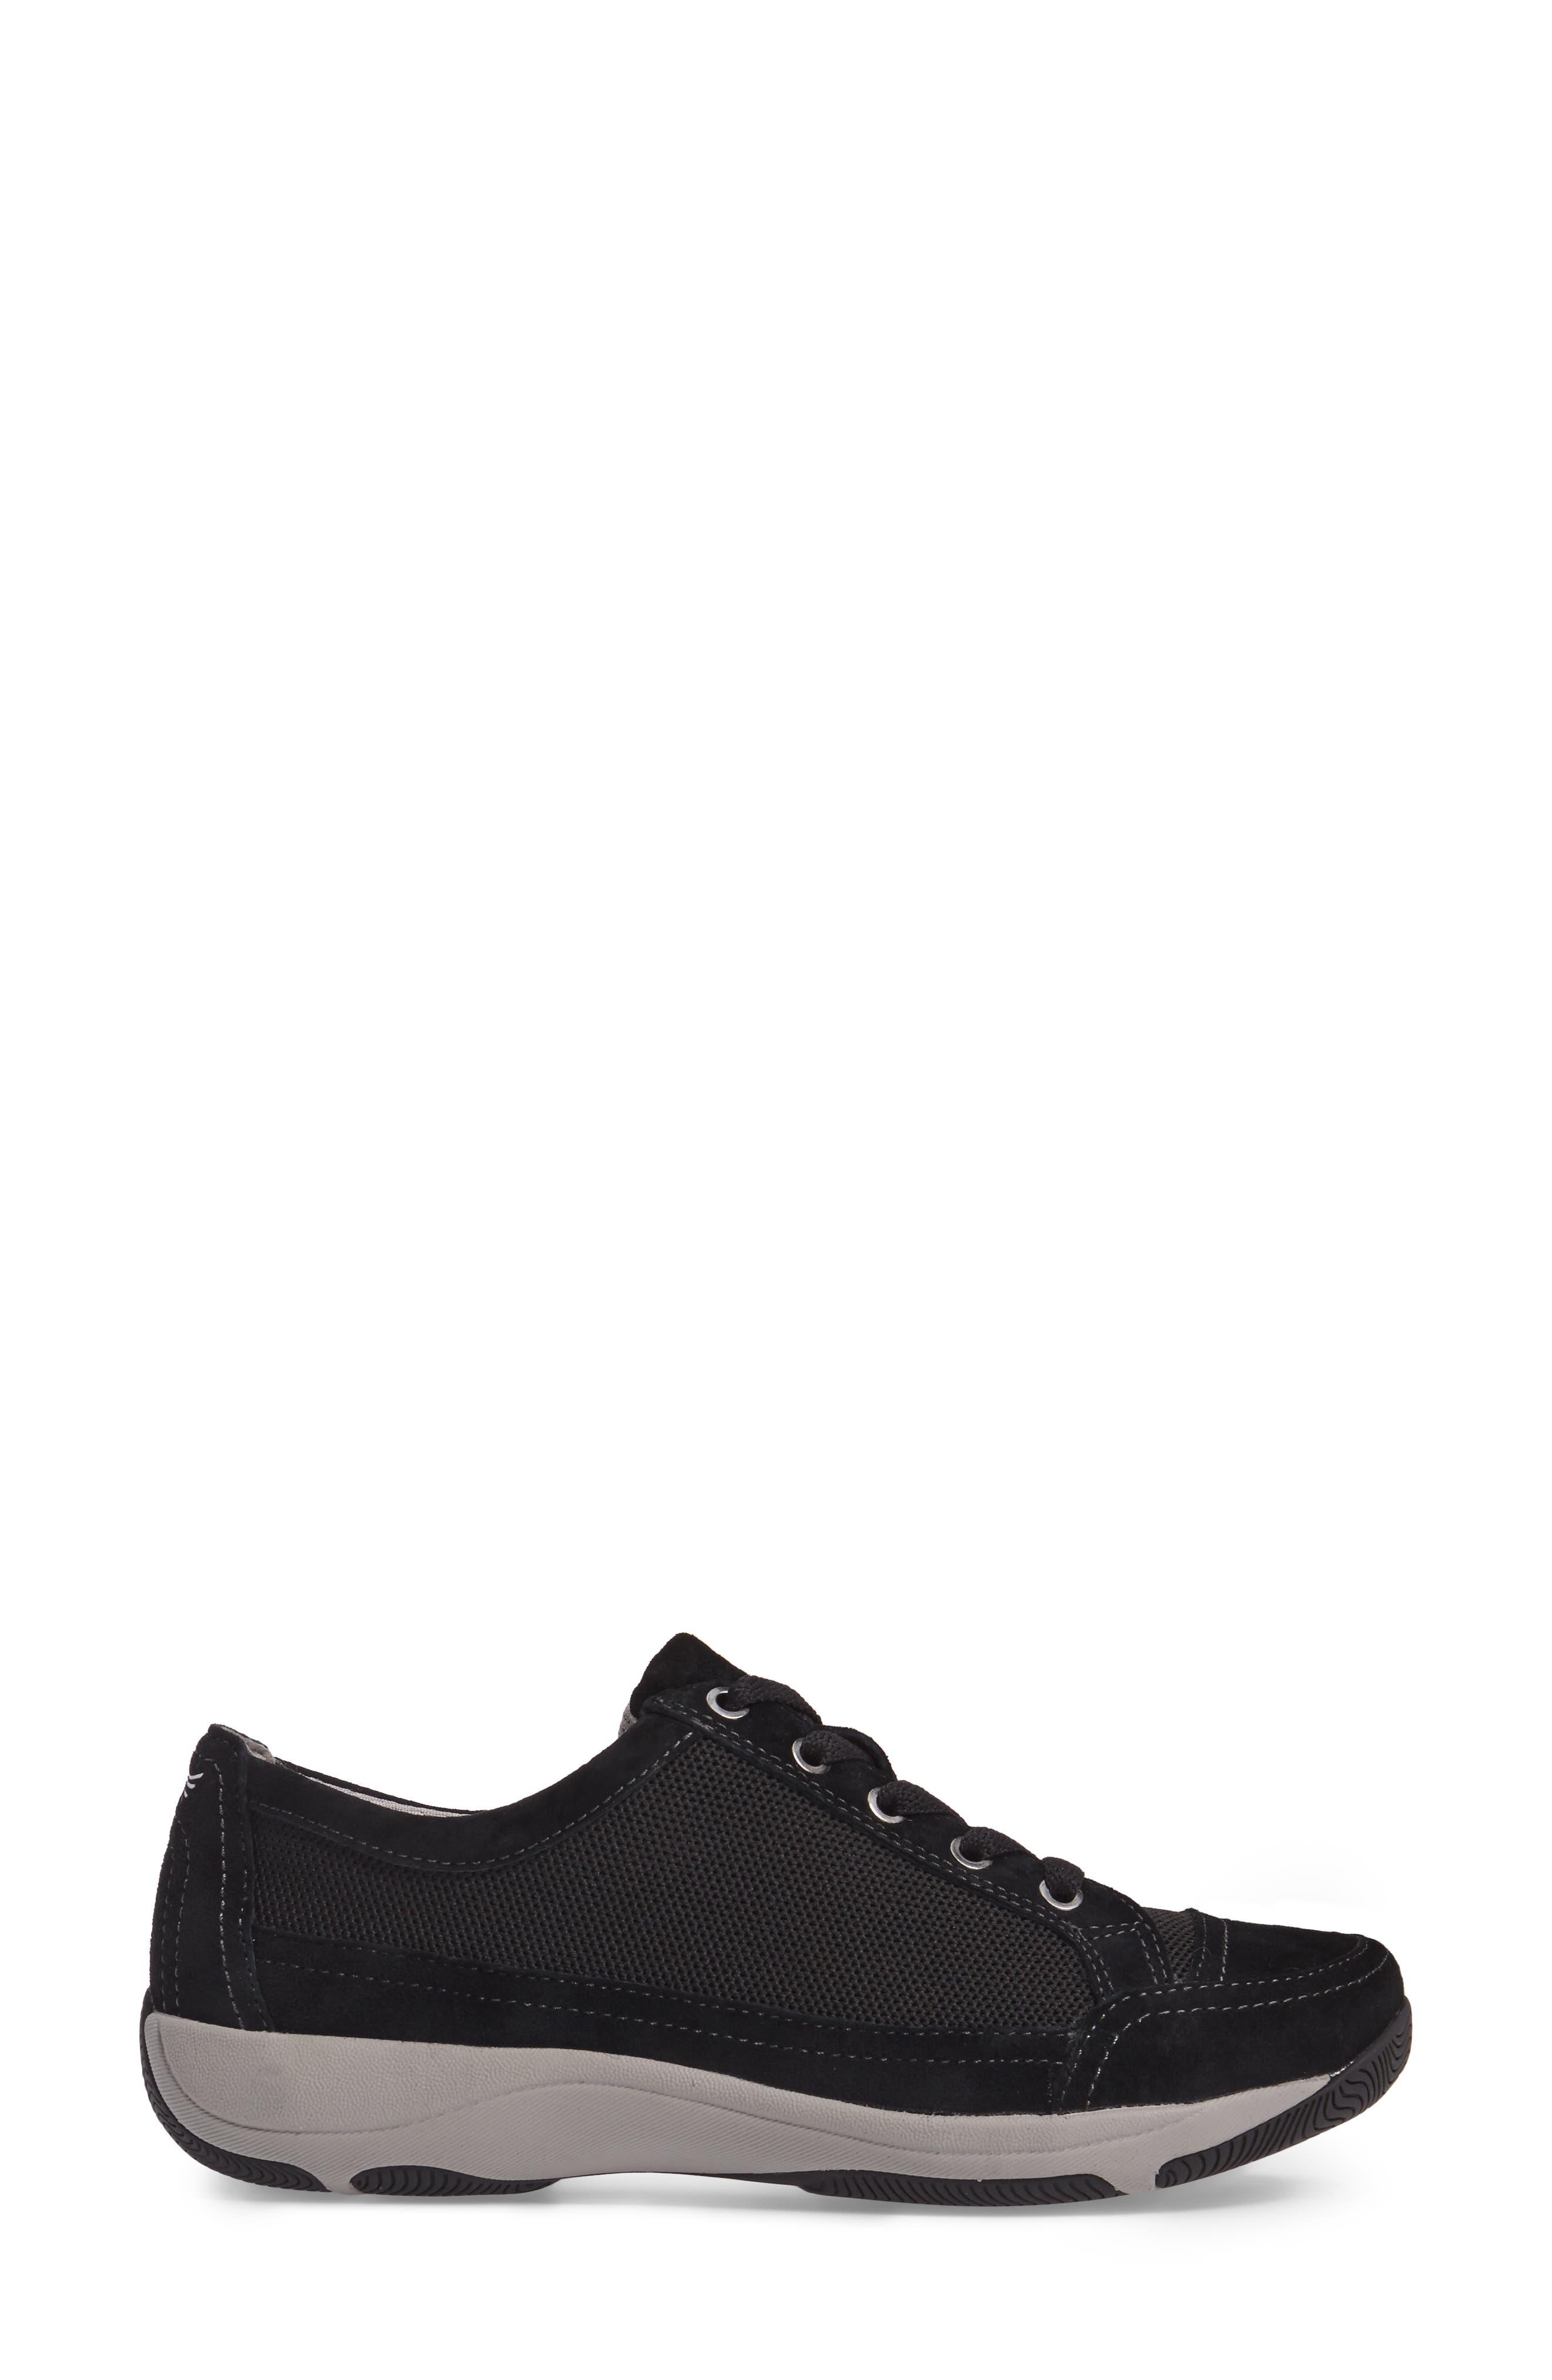 Harmony Sneaker,                             Alternate thumbnail 3, color,                             001